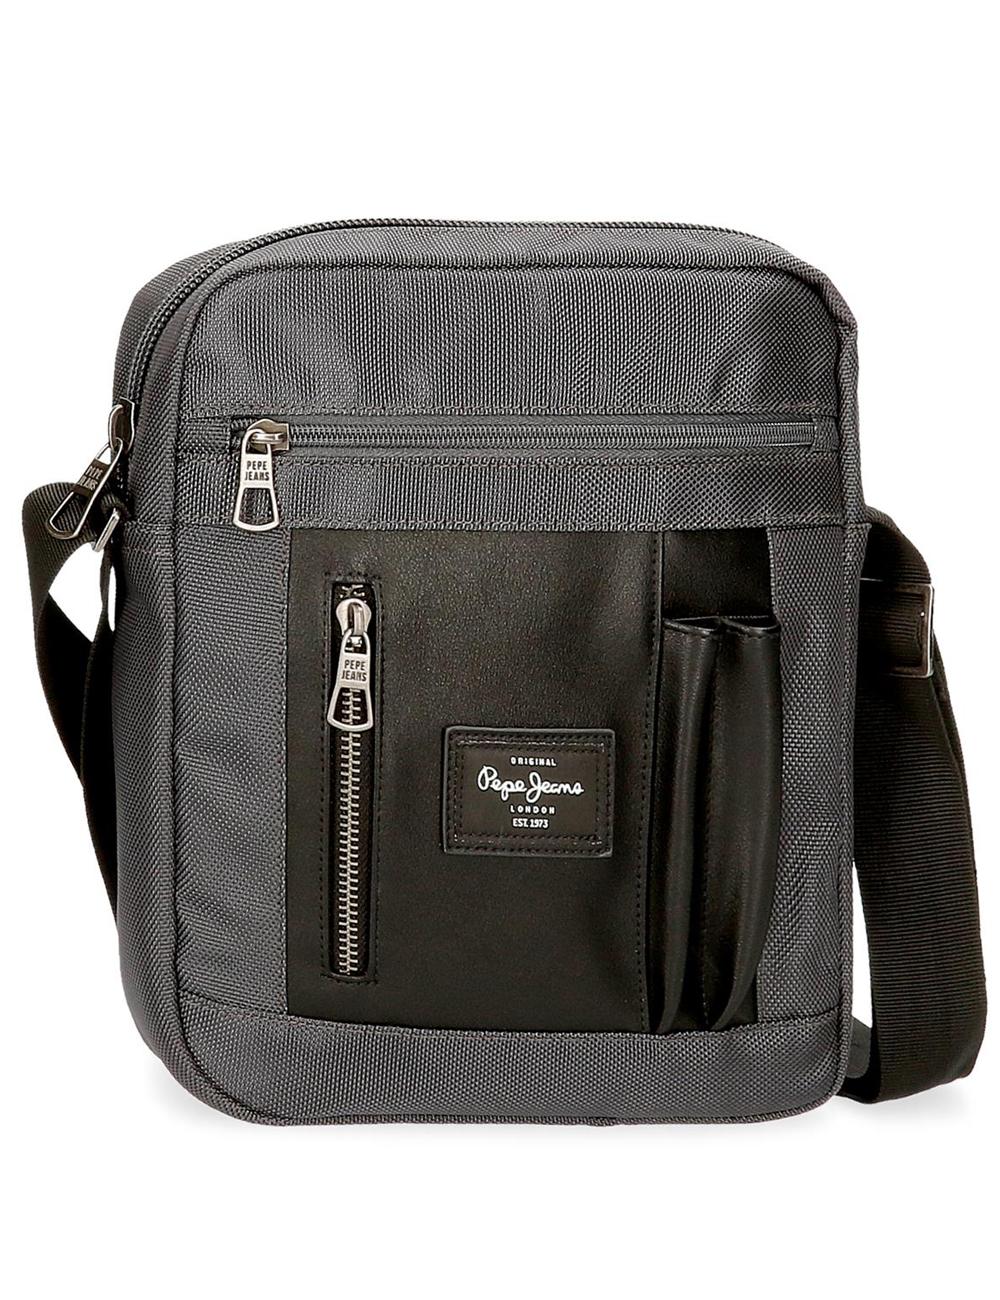 7645621 Bandolera 27cm Porta Tablet Pepe jeans Bomber Gris